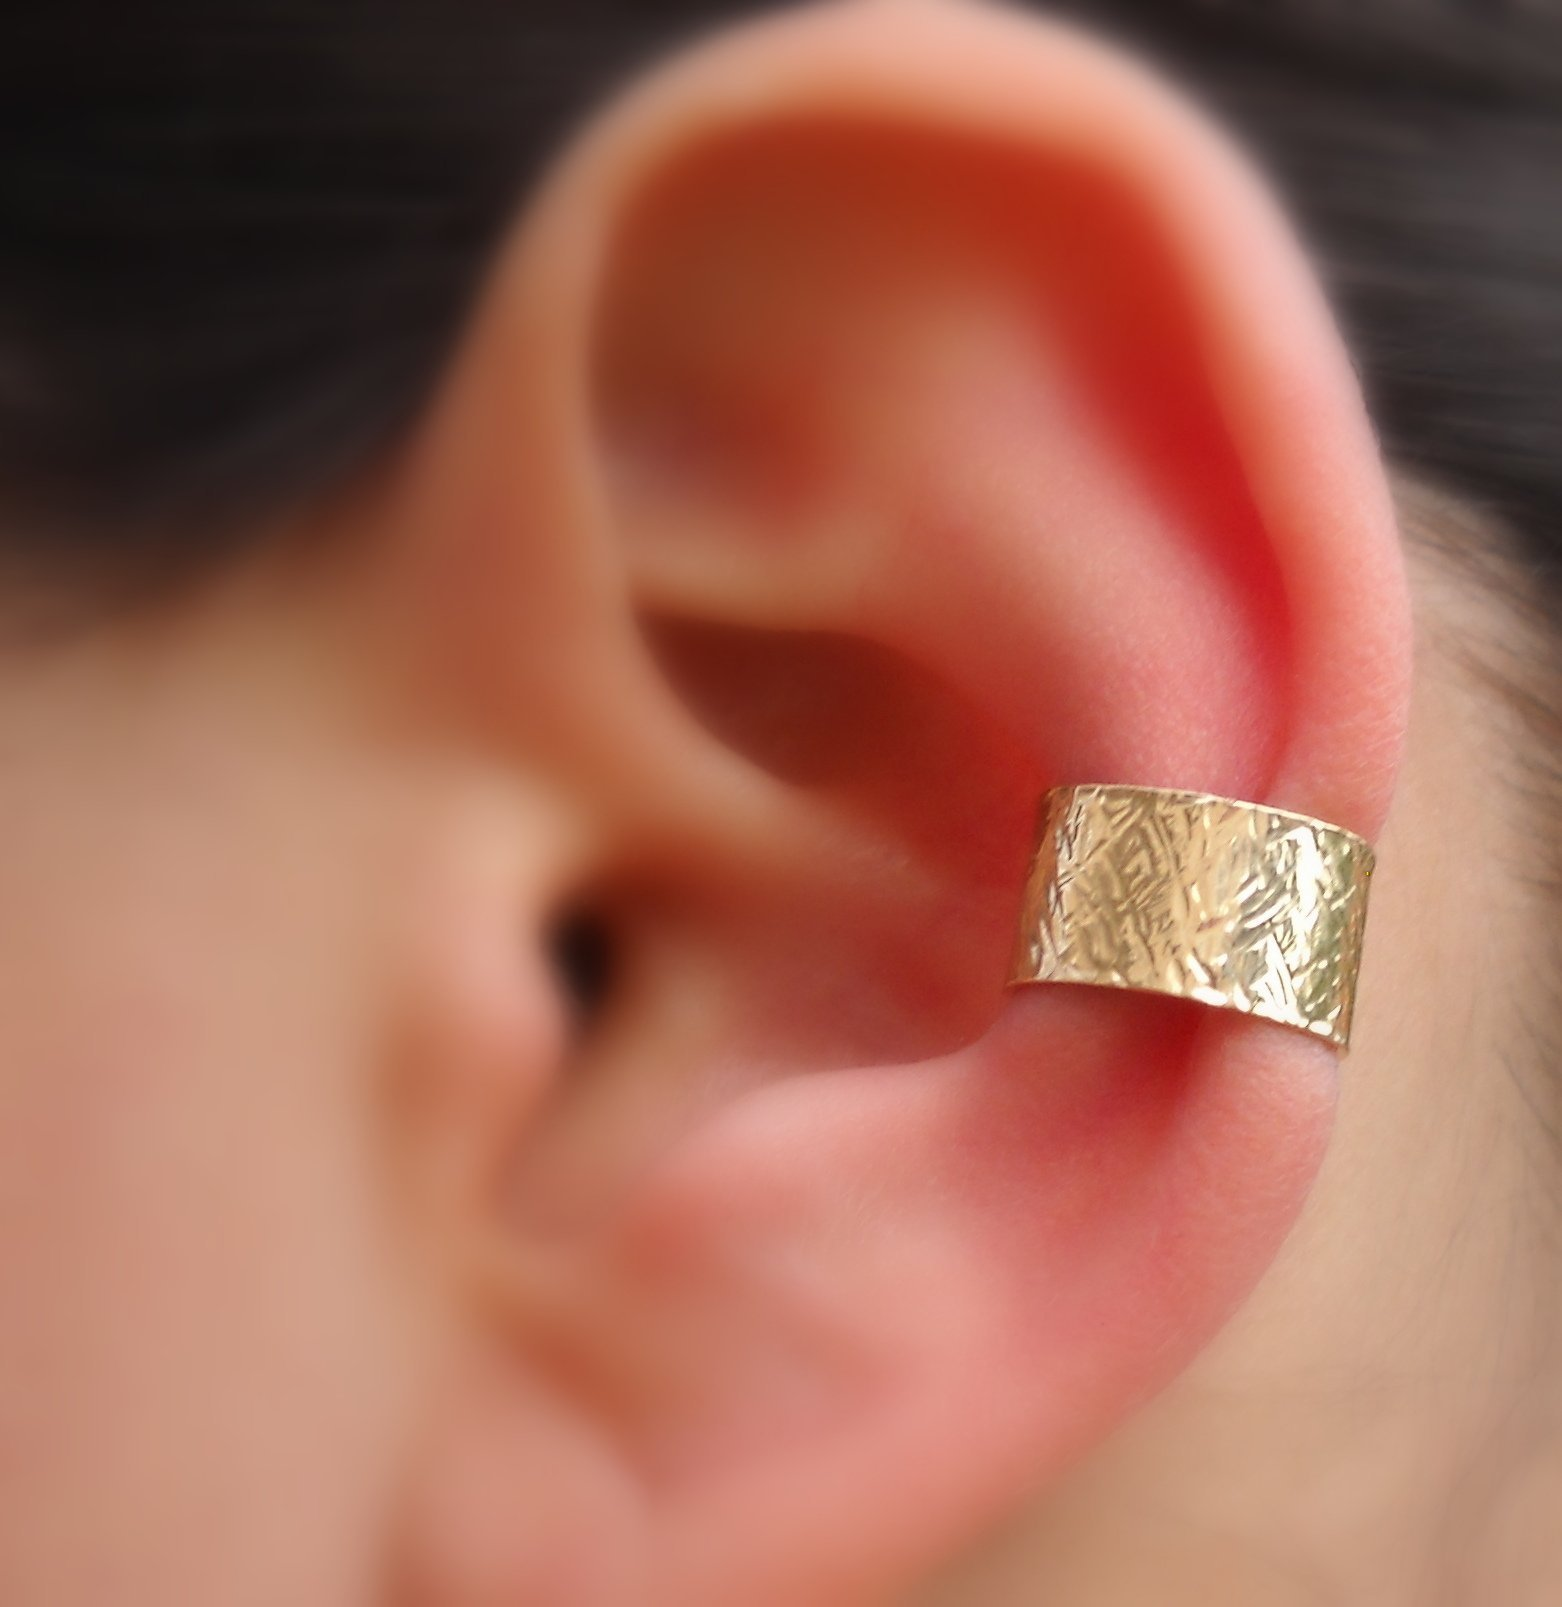 Ear Cuff - Fake Piercing - Fake Conch Piercing - Non Pierced Conch Cuff - 14K Solid Gold 7mm Wide